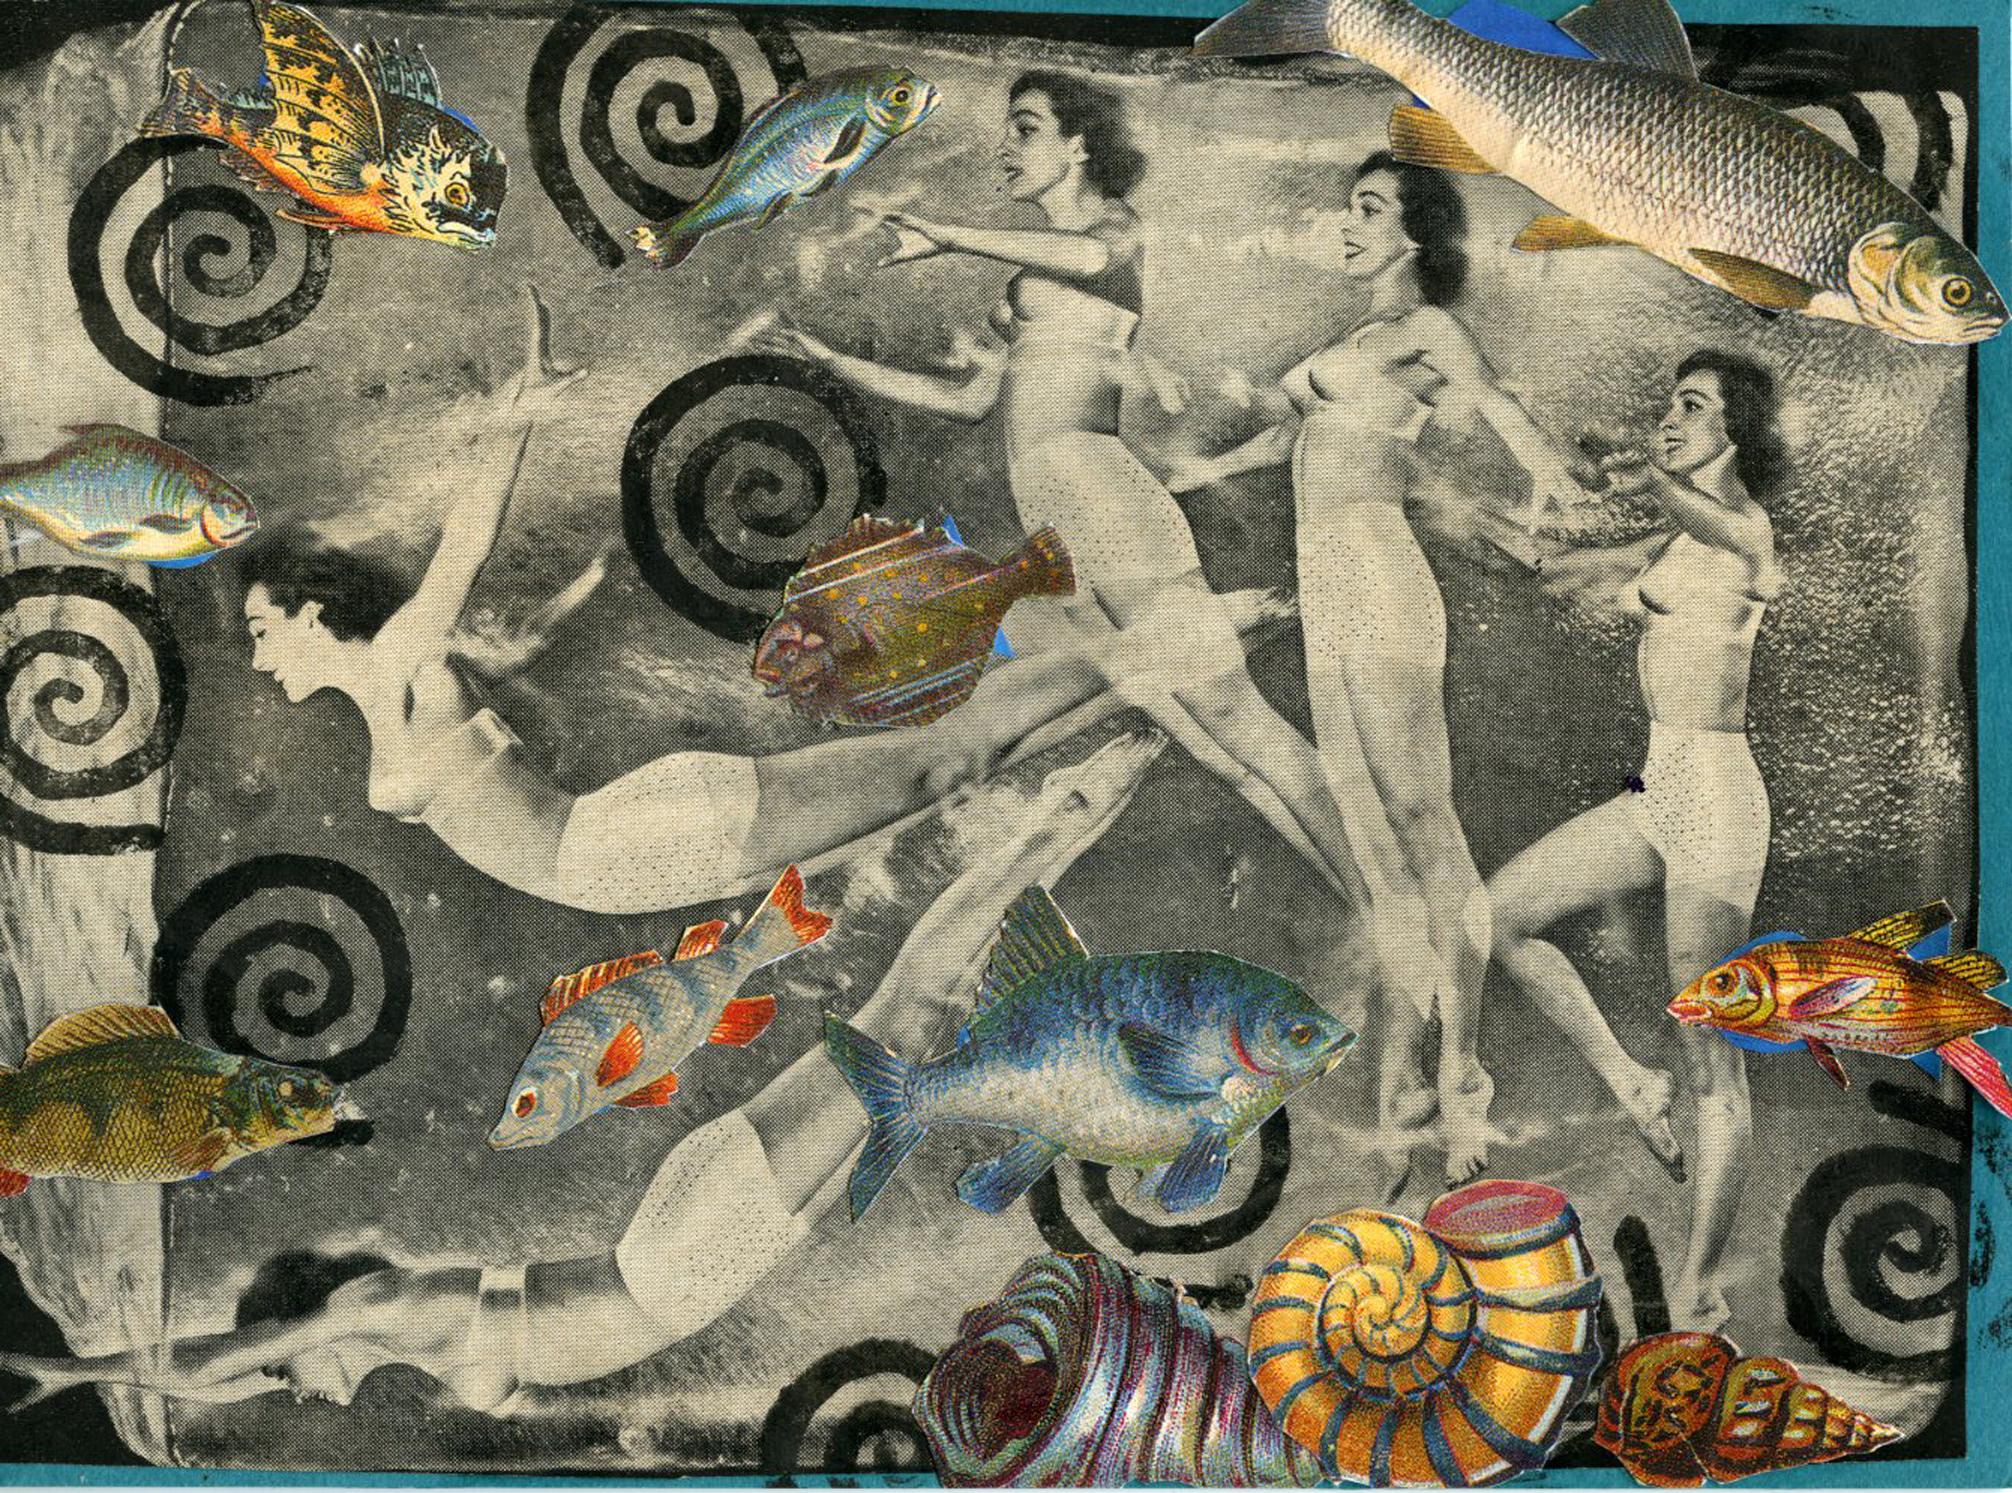 Vintage Swimmers